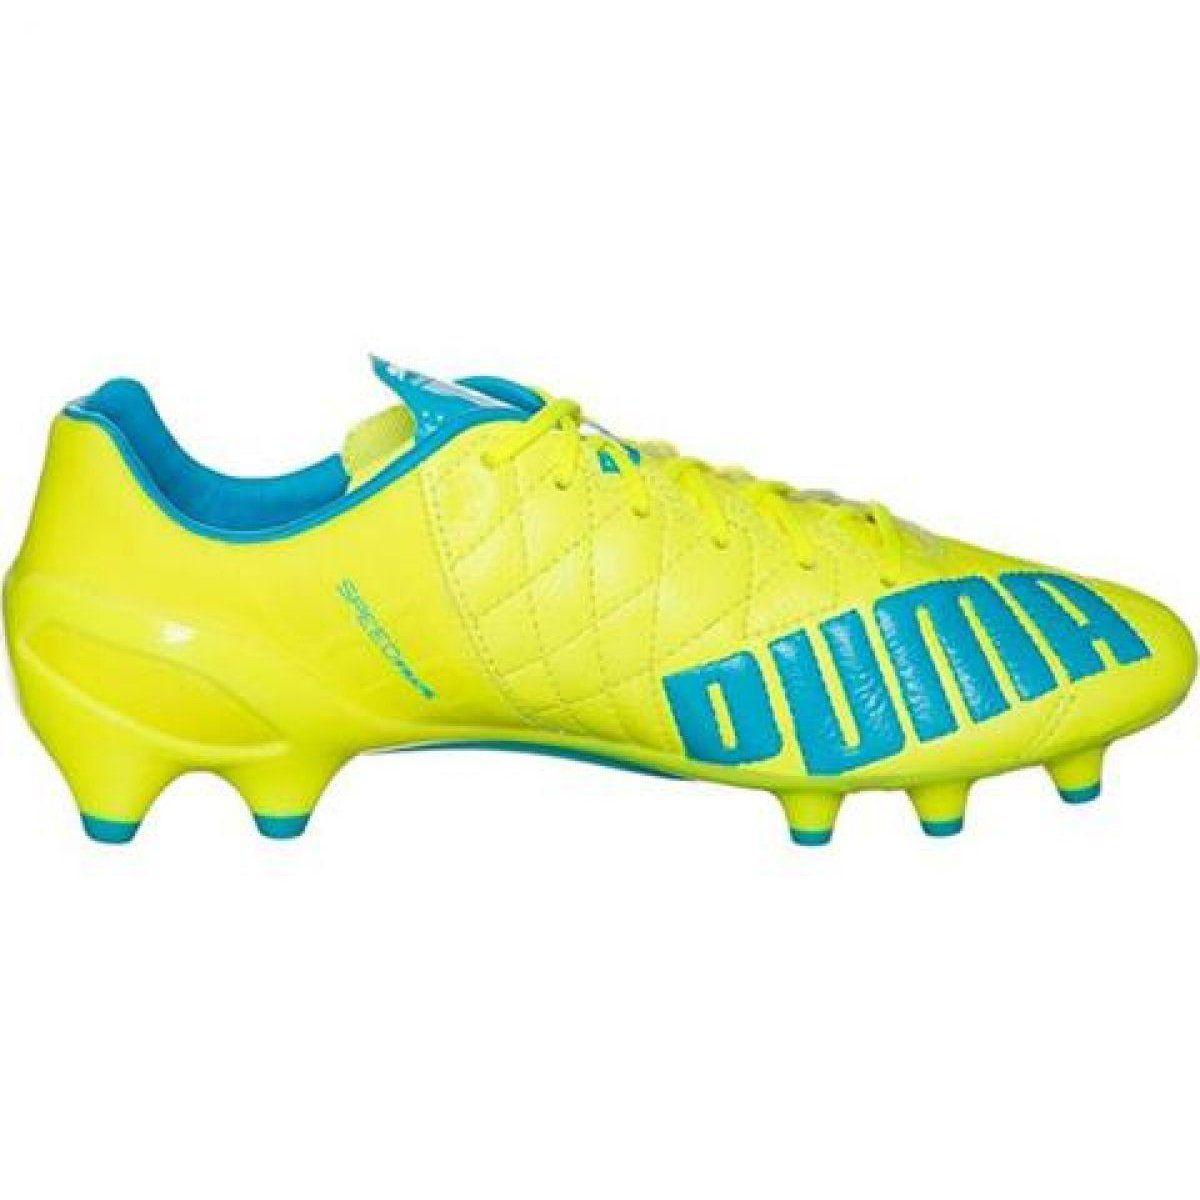 Buty Pilkarskie Puma Evo Speed 1 4 Lth Fg M 103615 03 Zolte Zolte Football Shoes Free Shipping Shoes Puma